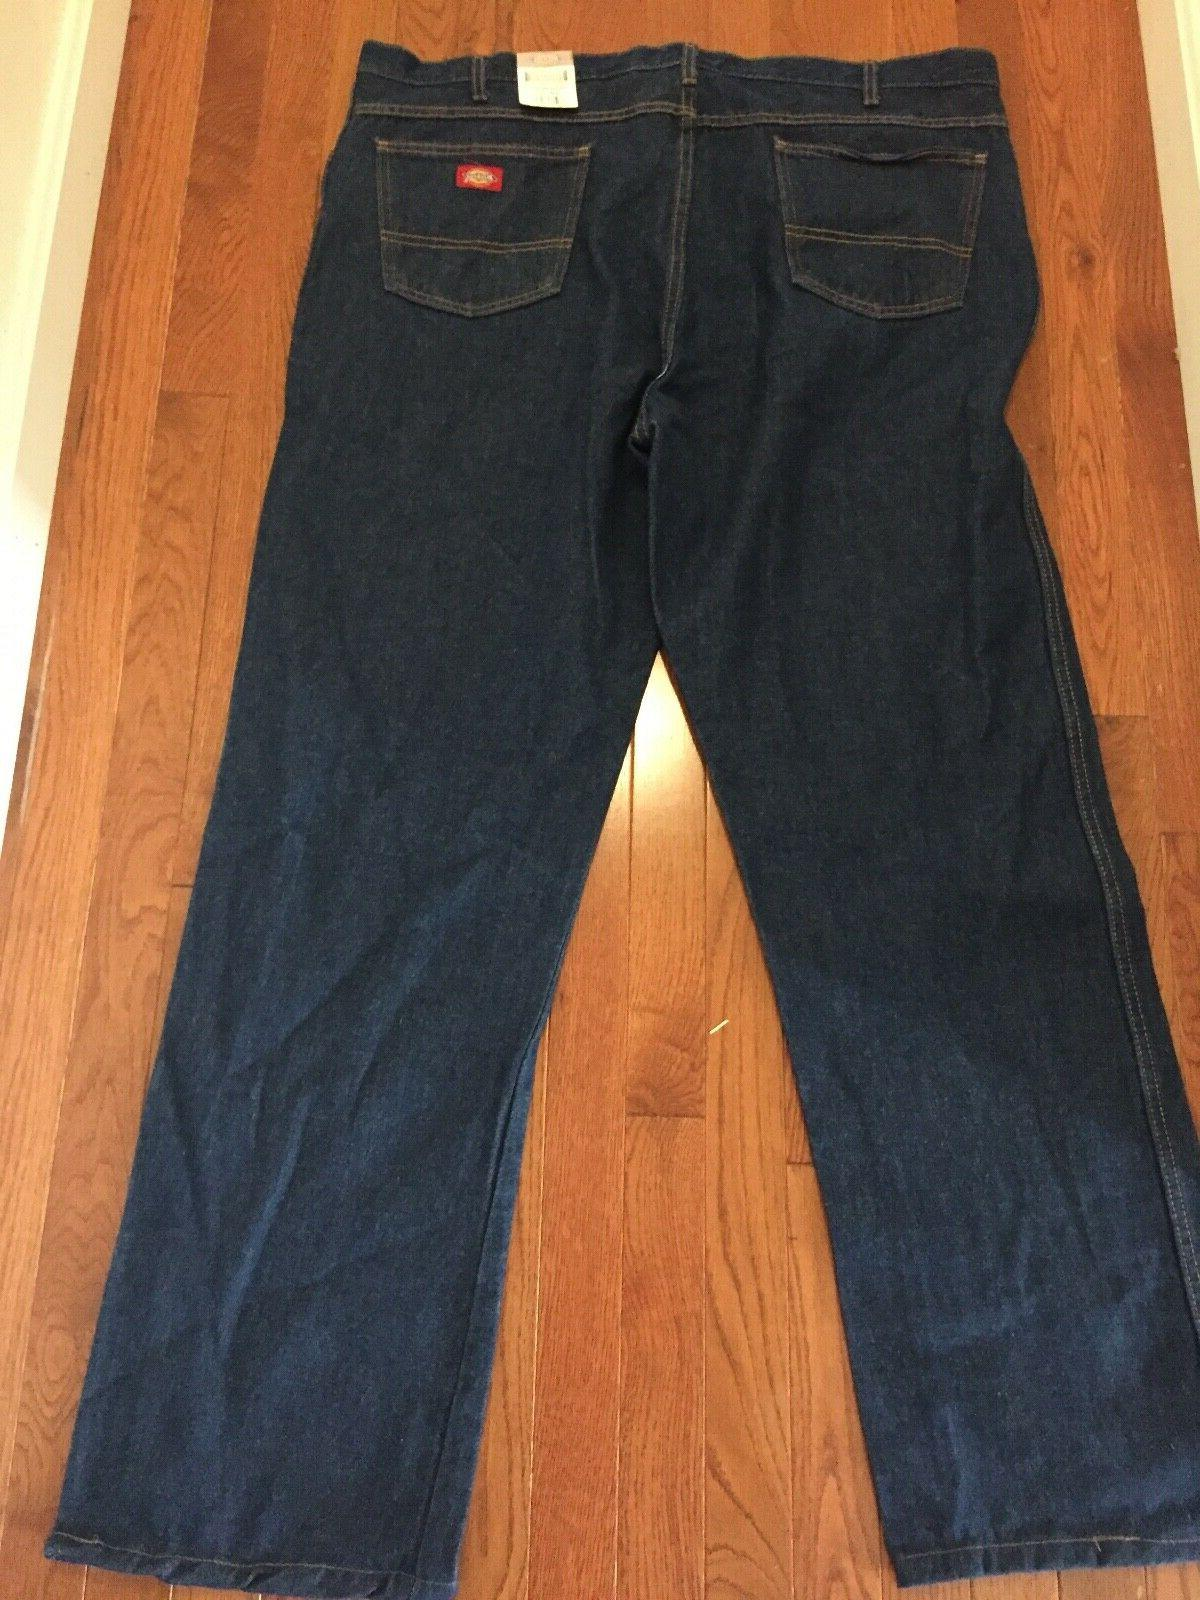 Dickies fit Denim Jeans 46x34 UL defect!